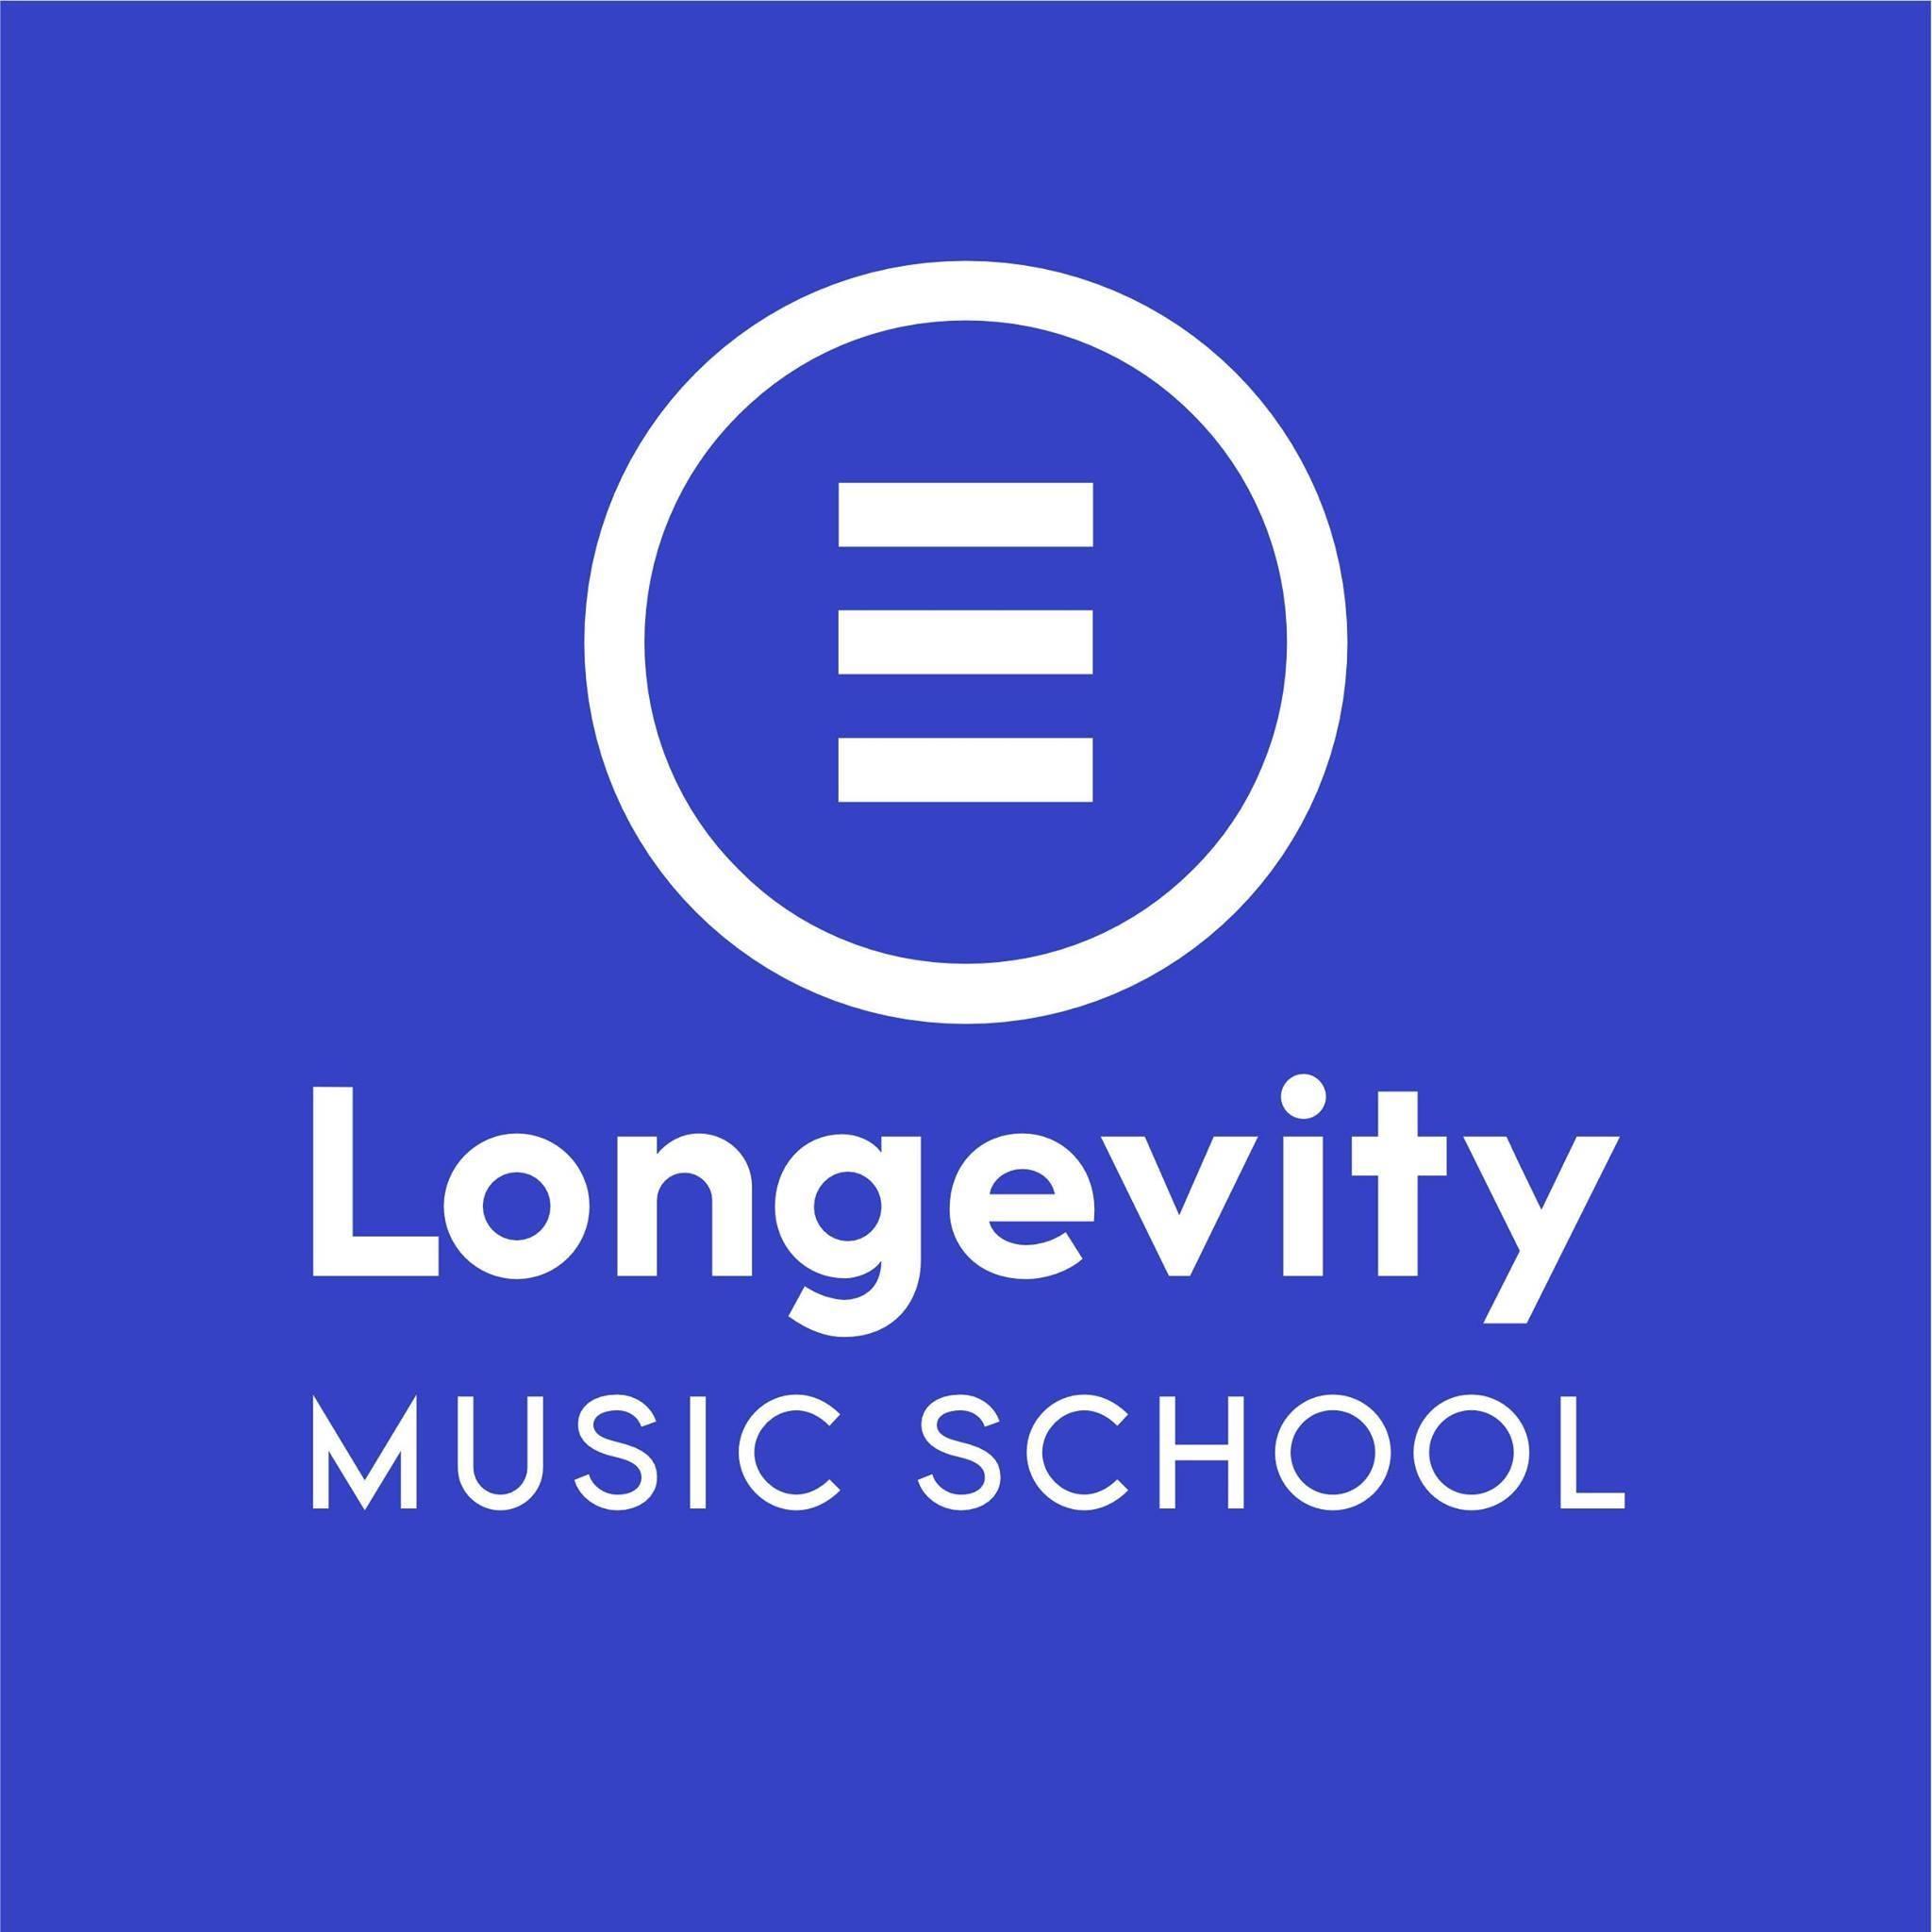 Présentation Longevity Music School